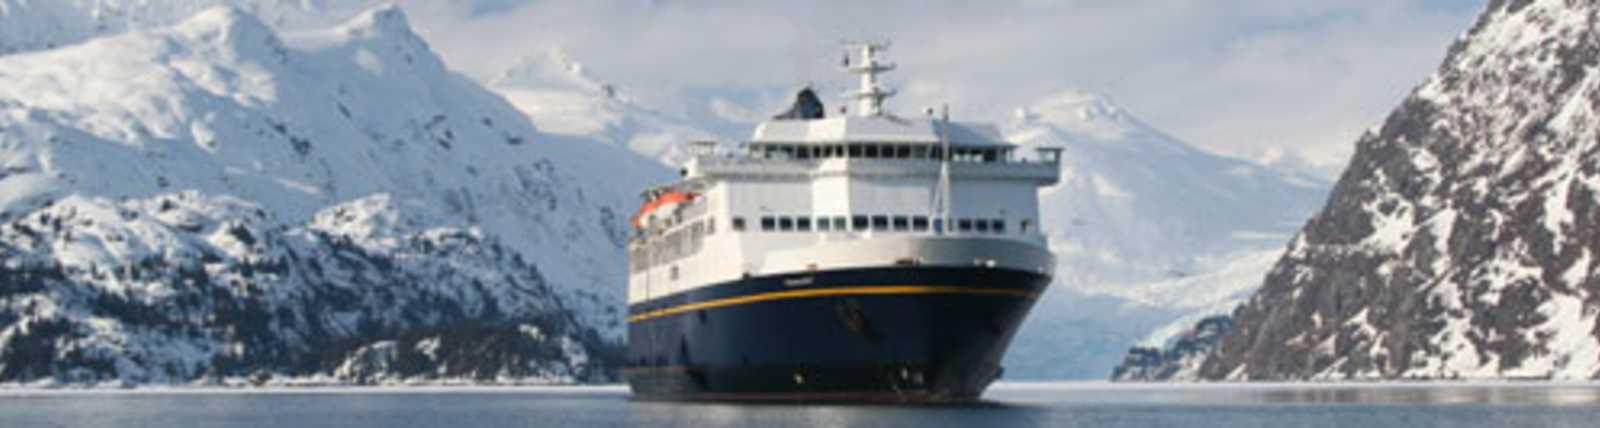 Alaska_State_Marine_Highway_System.jpg